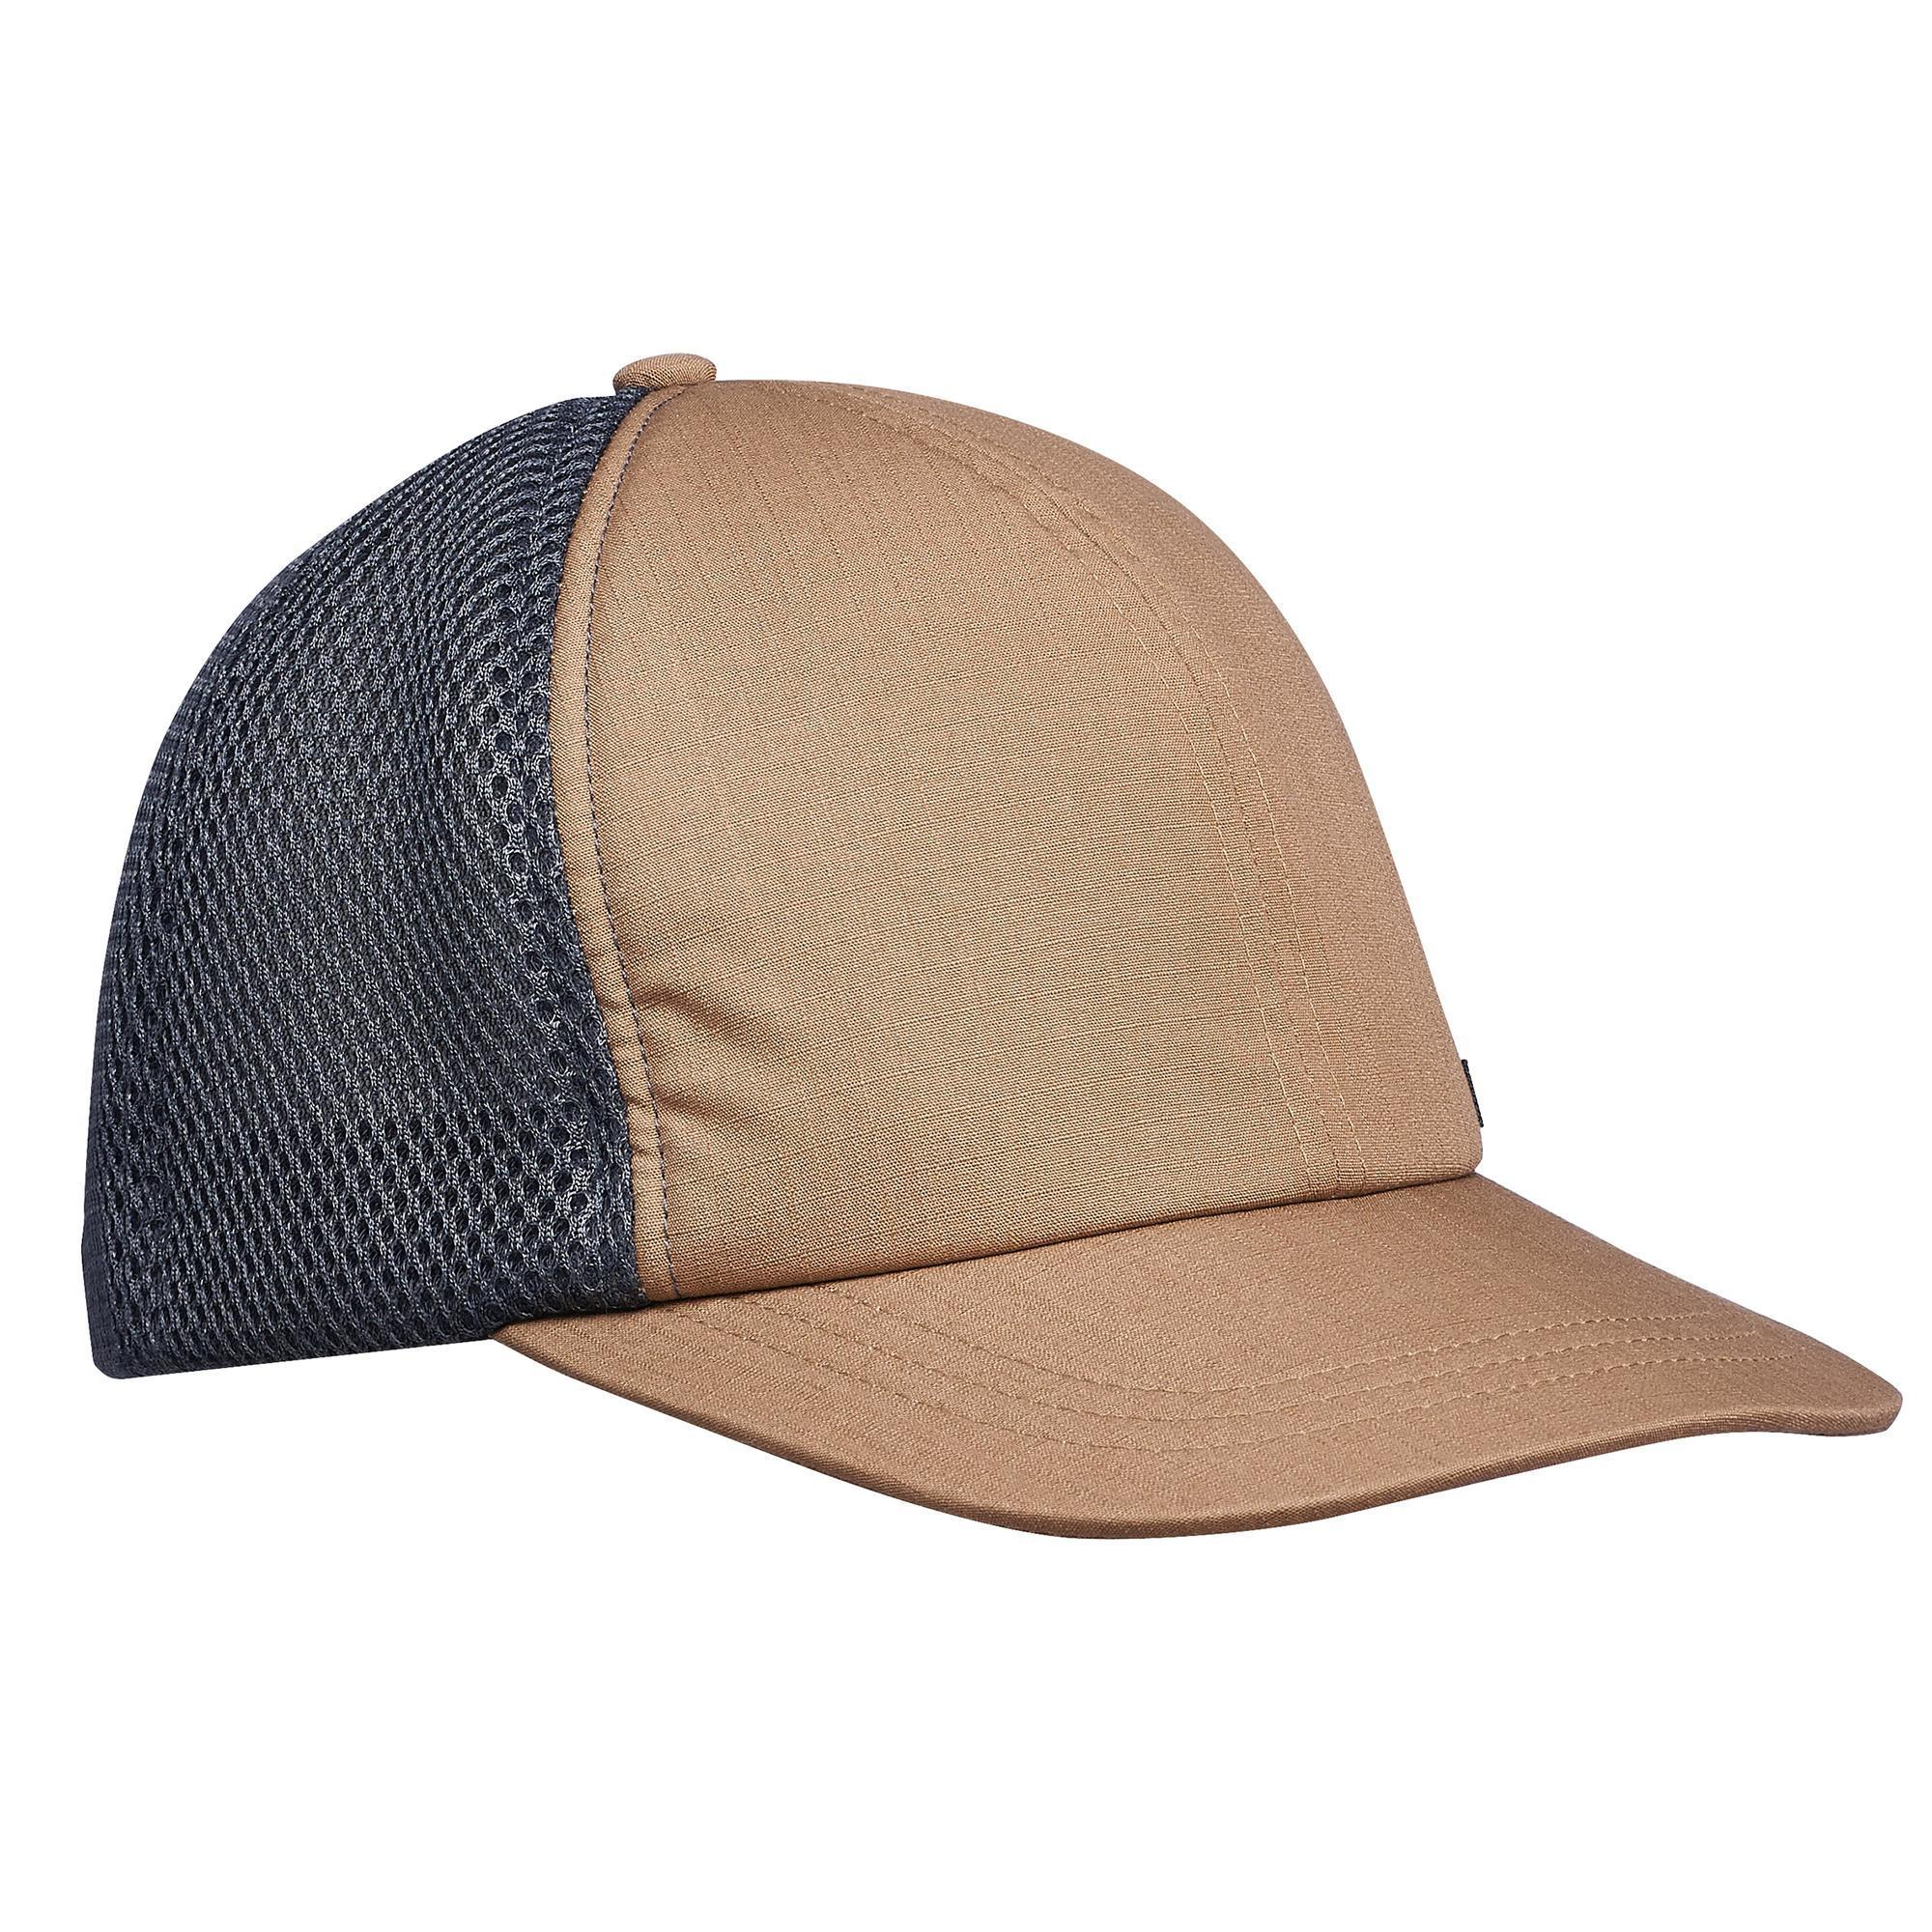 Schirmmütze Cap Travel 500 Camel | Accessoires > Caps > Sonstige Caps | Braun - Grau | Forclaz